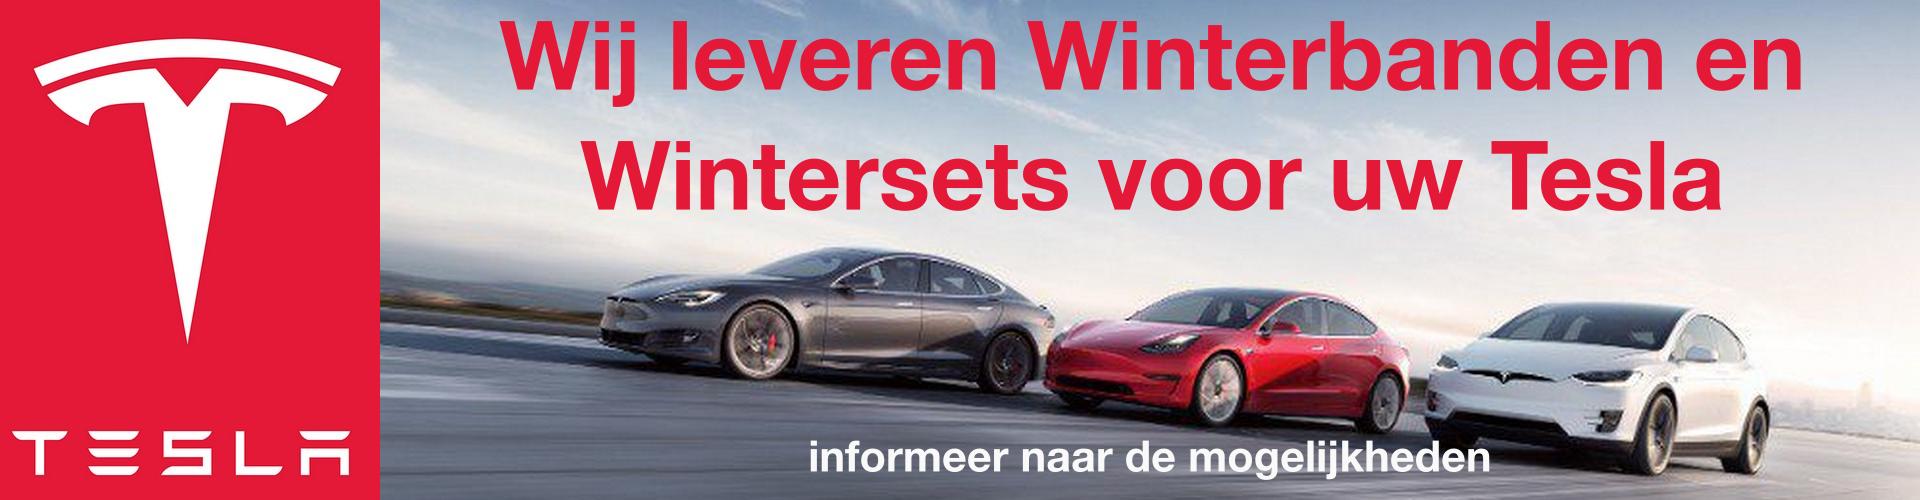 Tesla winterbanden en wintersets